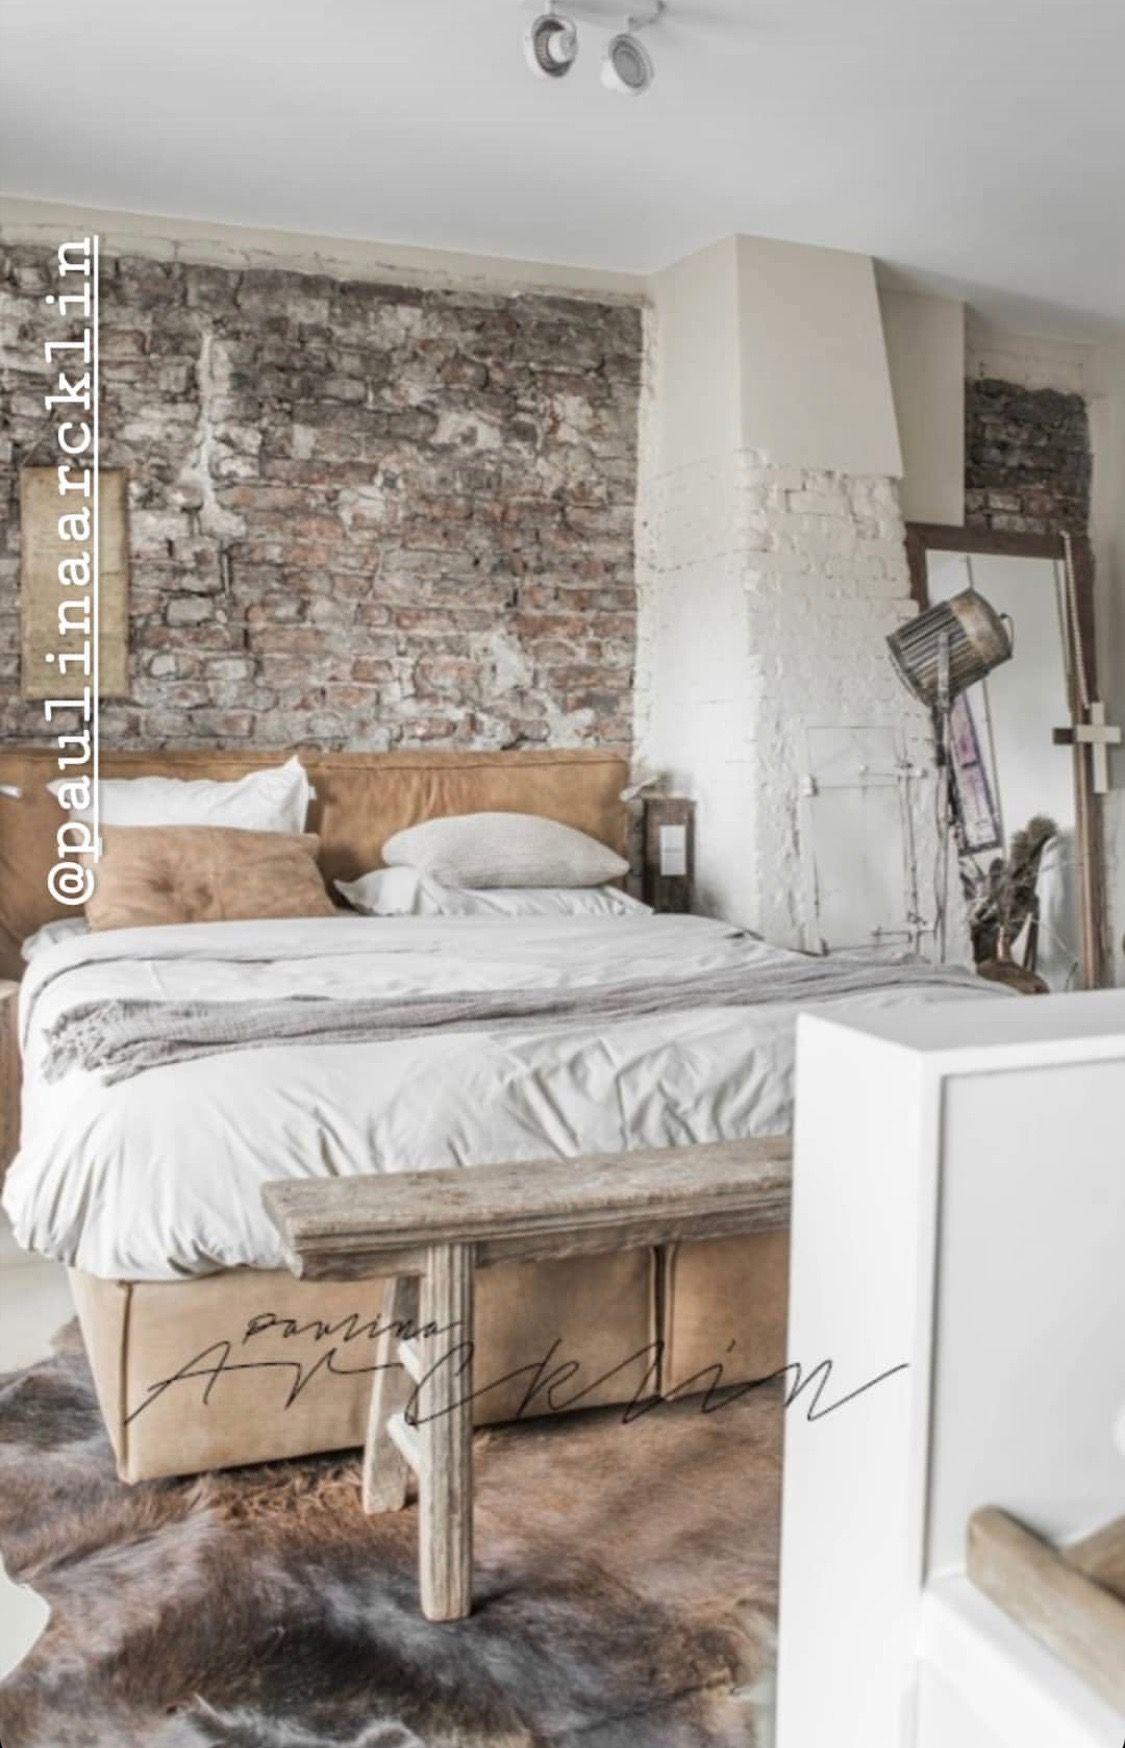 Image By Suad Habib On Bedrooms Industrial Style Bedroom Industrial Bedroom Design Industrial Decor Bedroom